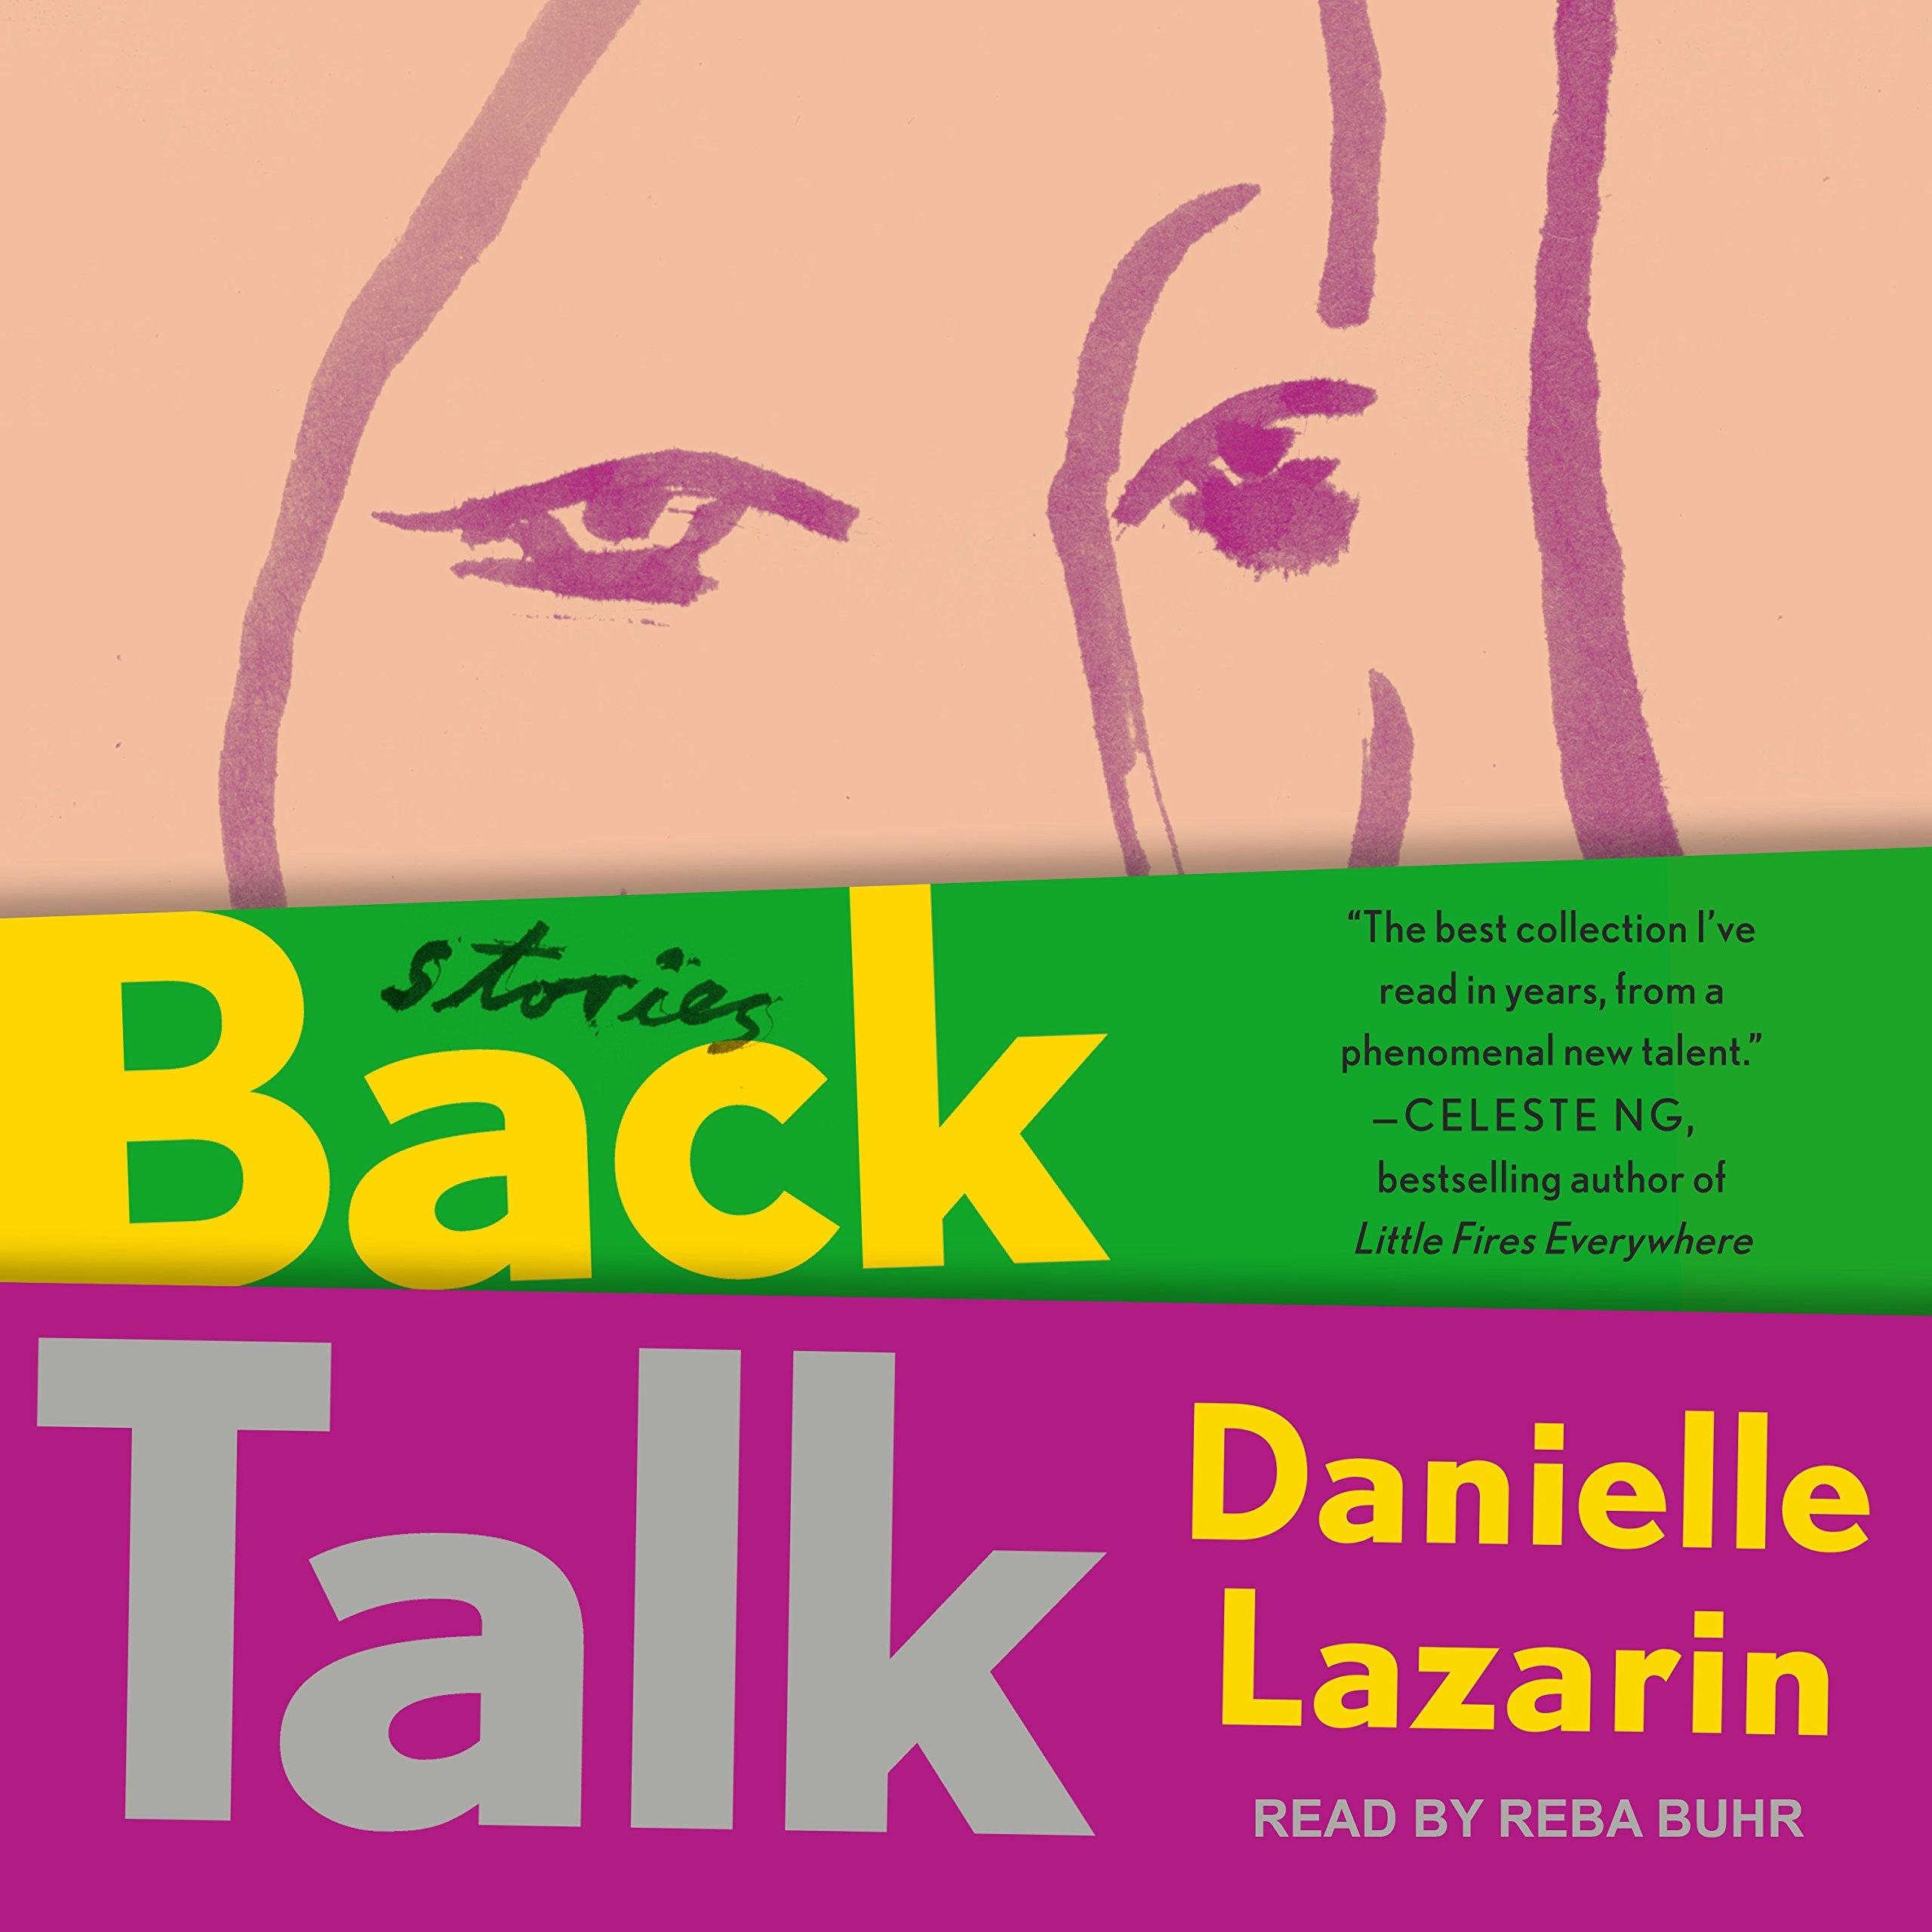 Back talk stories danielle lazarin reba buhr 9781977355058 back talk stories danielle lazarin reba buhr 9781977355058 amazon books fandeluxe Choice Image